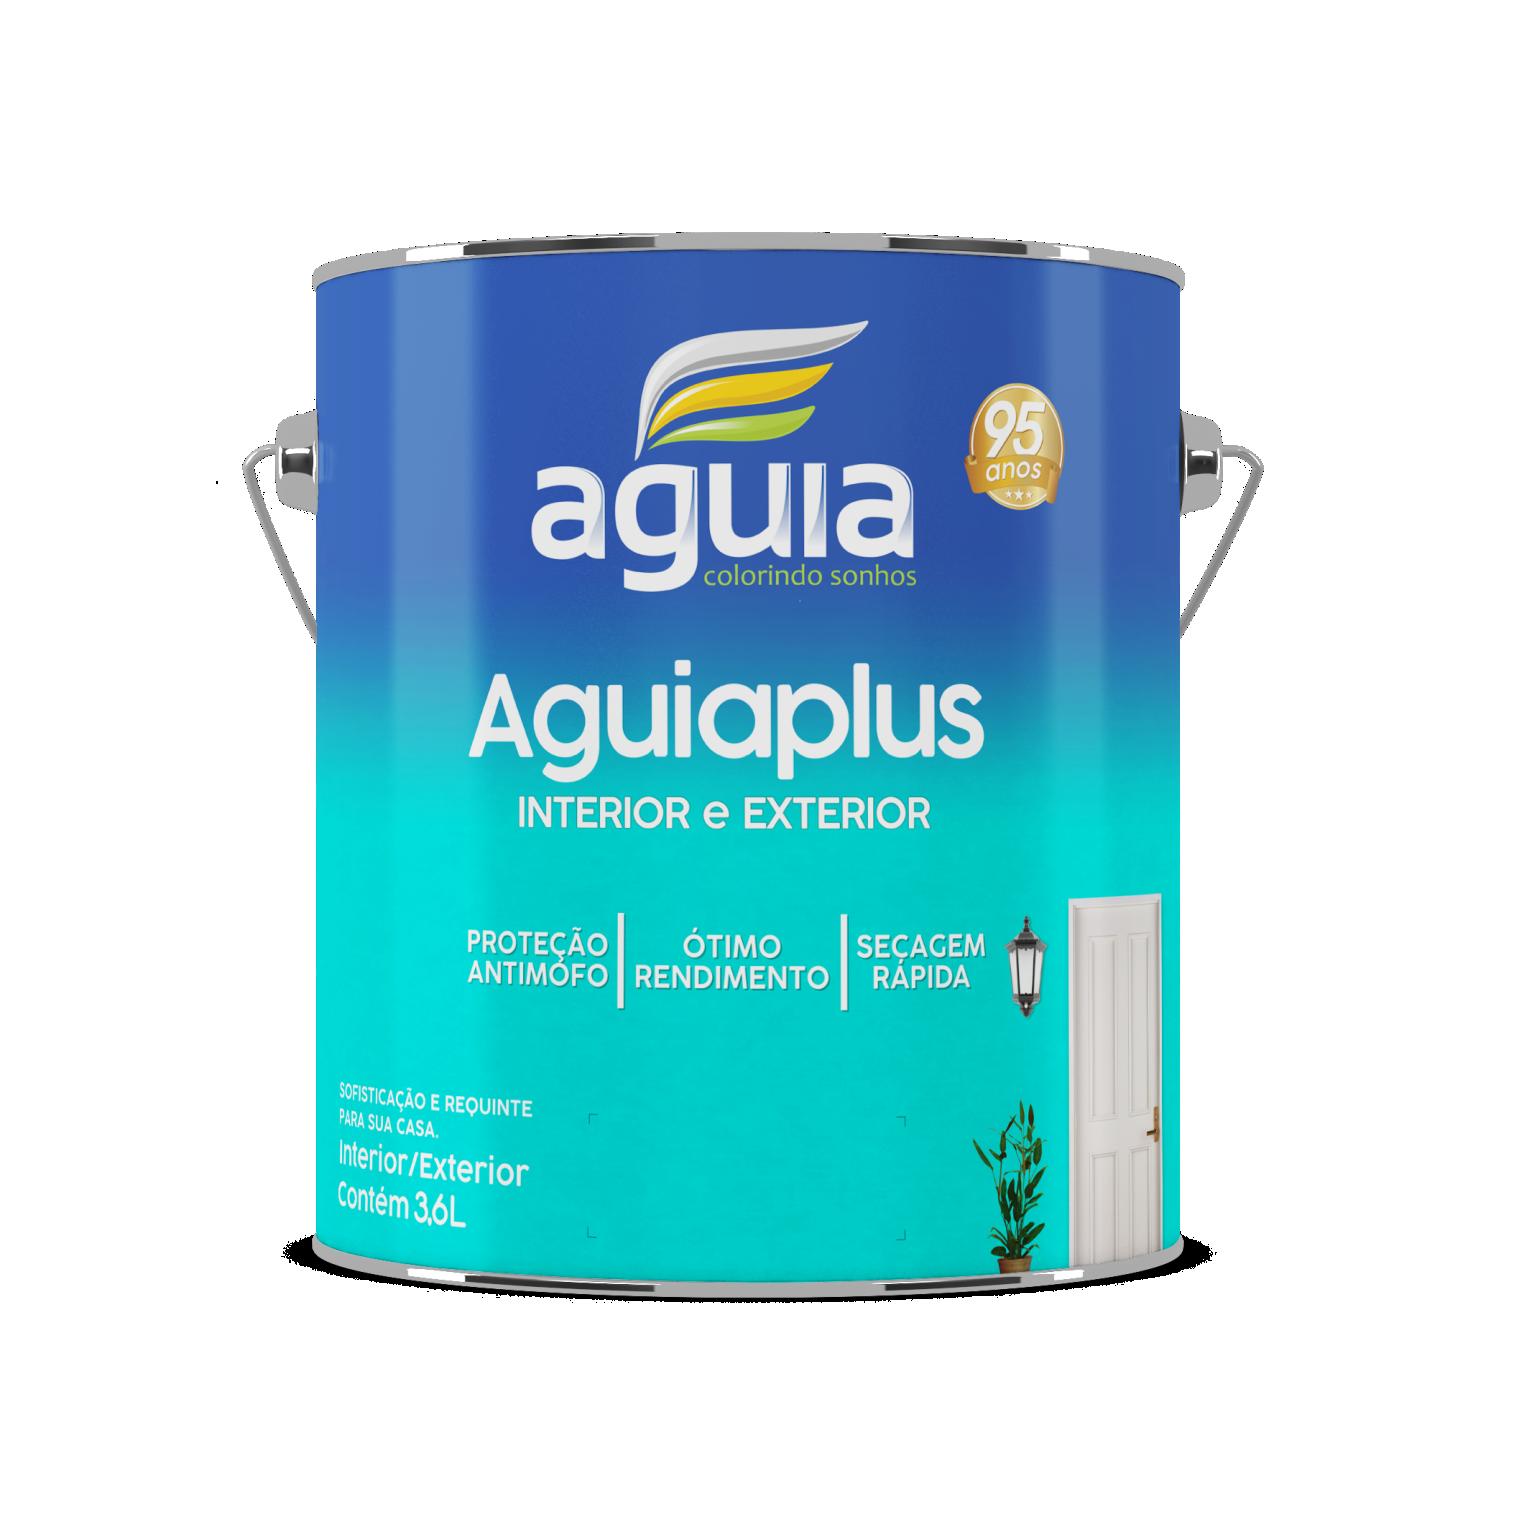 AGUIAPLUS